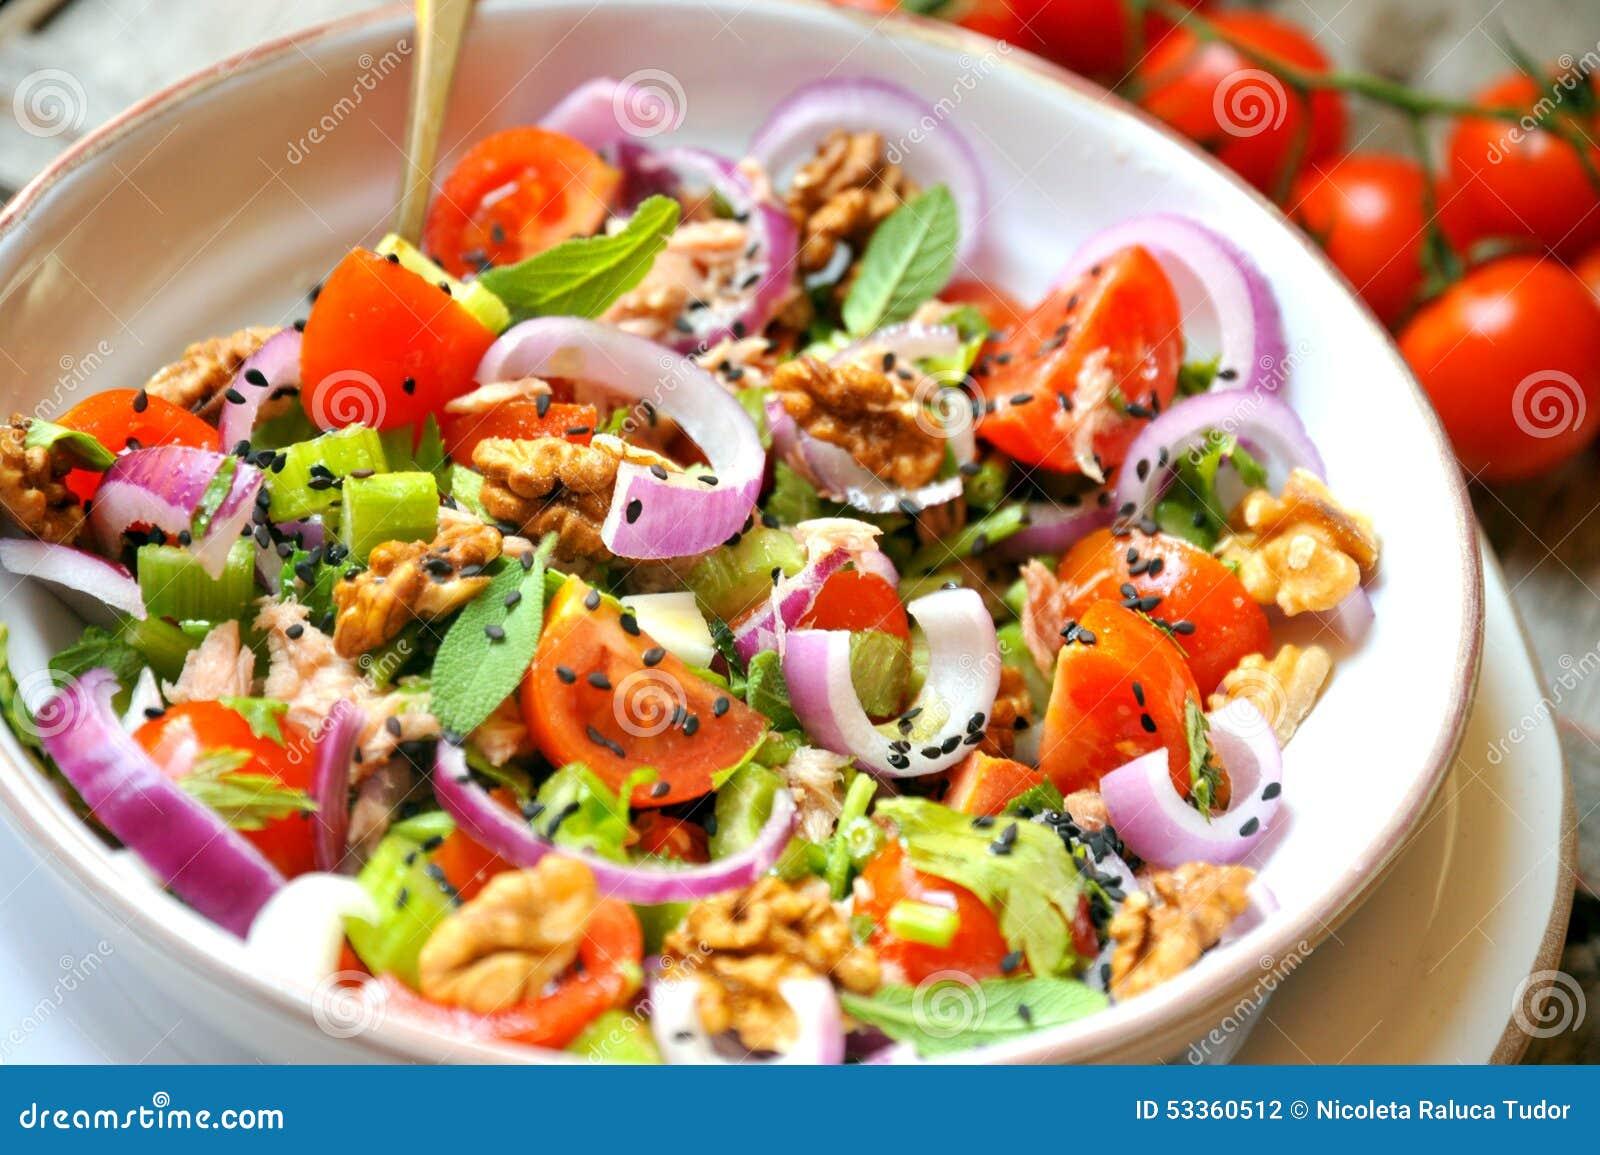 Detox , veggie, raw salad with tomato, onions and walnuts